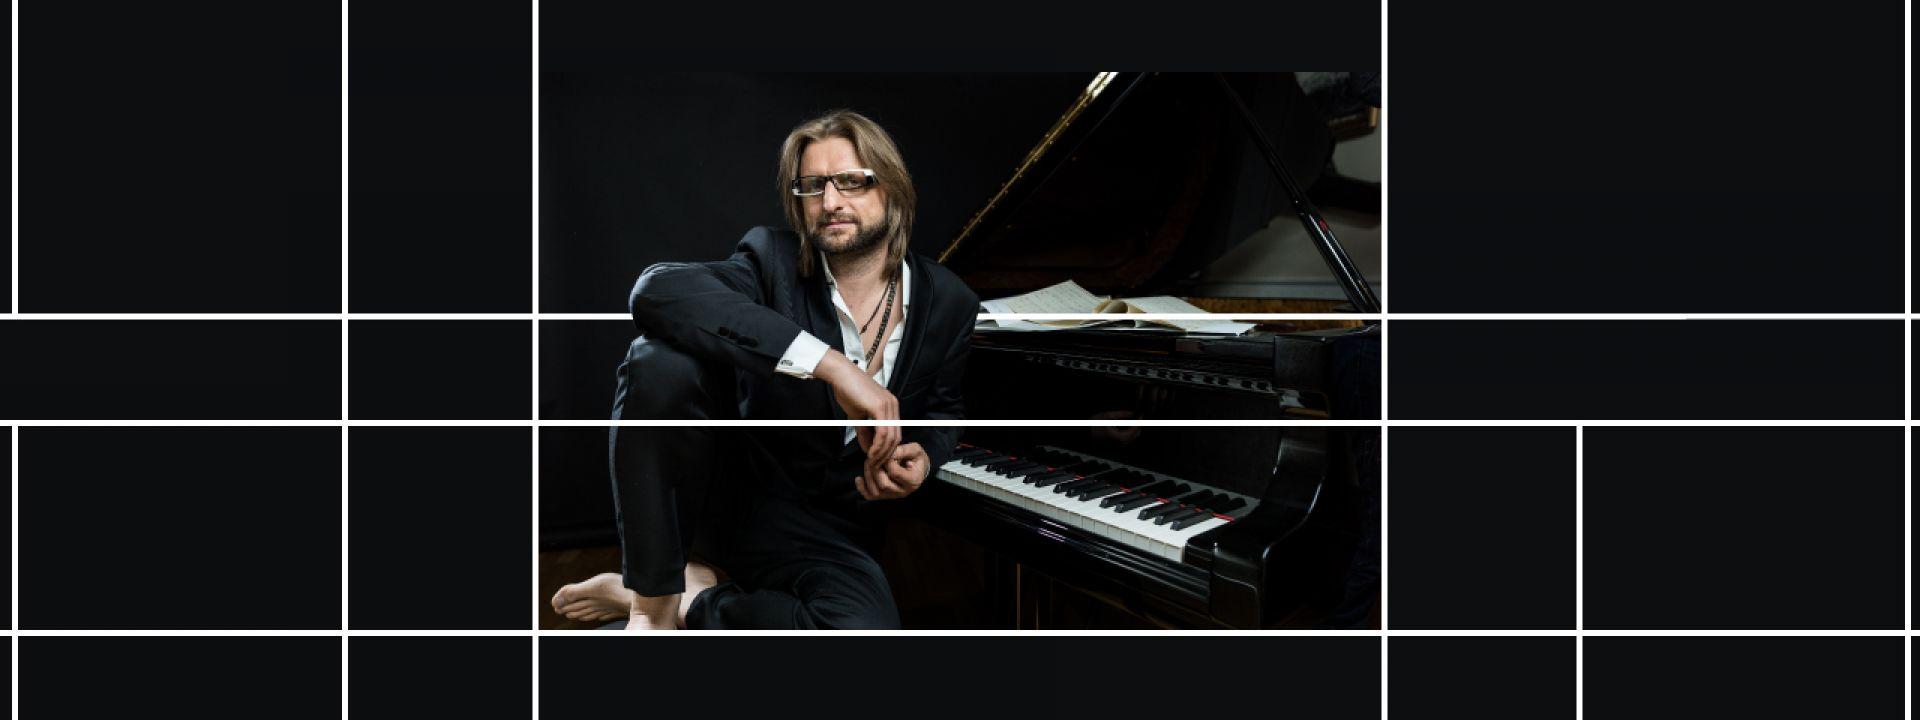 Leszek Możdżer: Polish jazz pianist